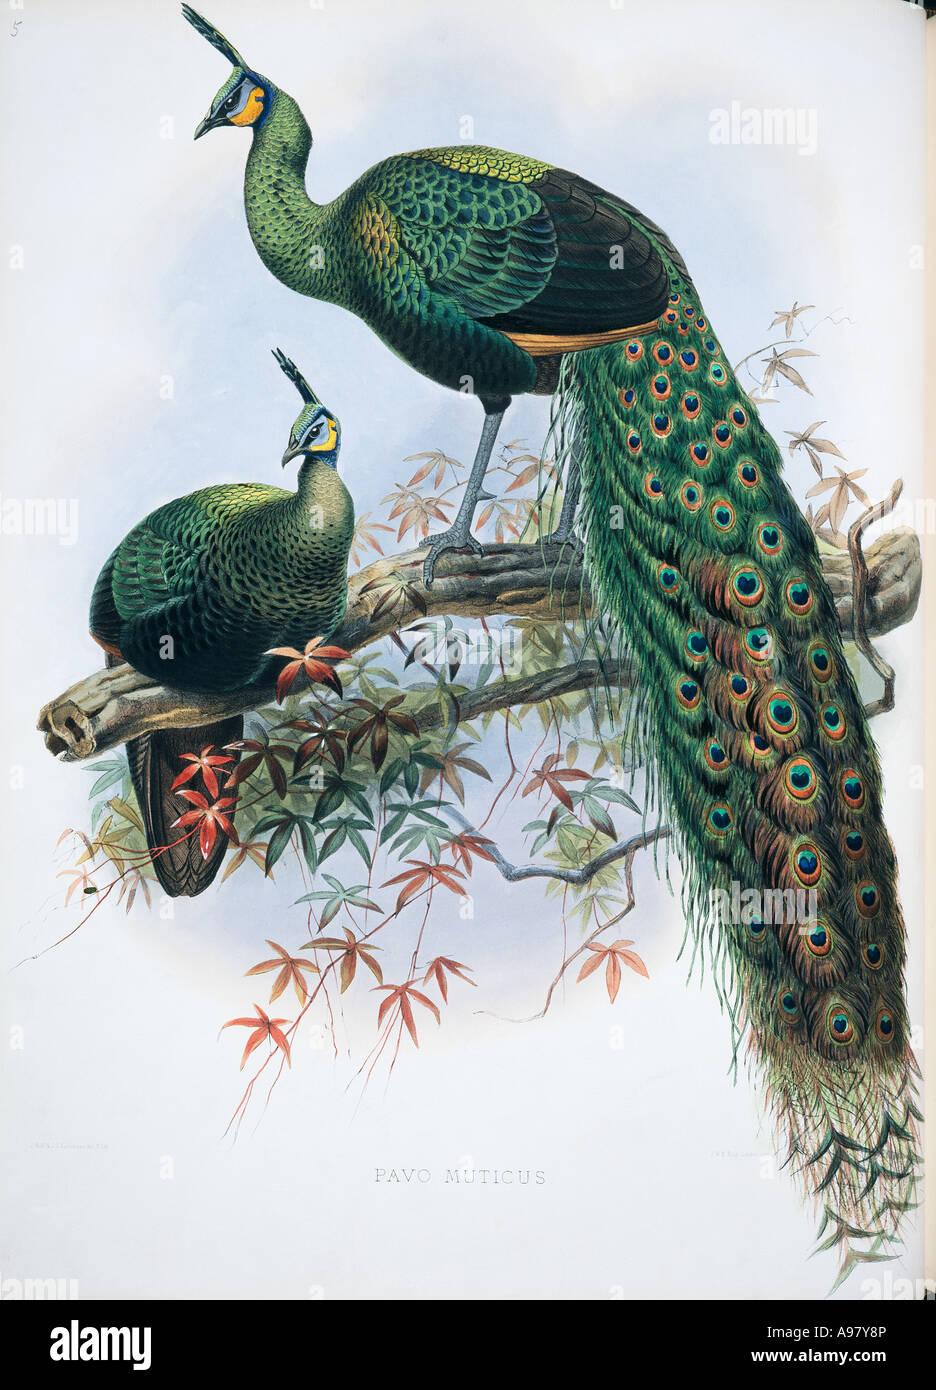 Pavo muticus green peafowl - Stock Image